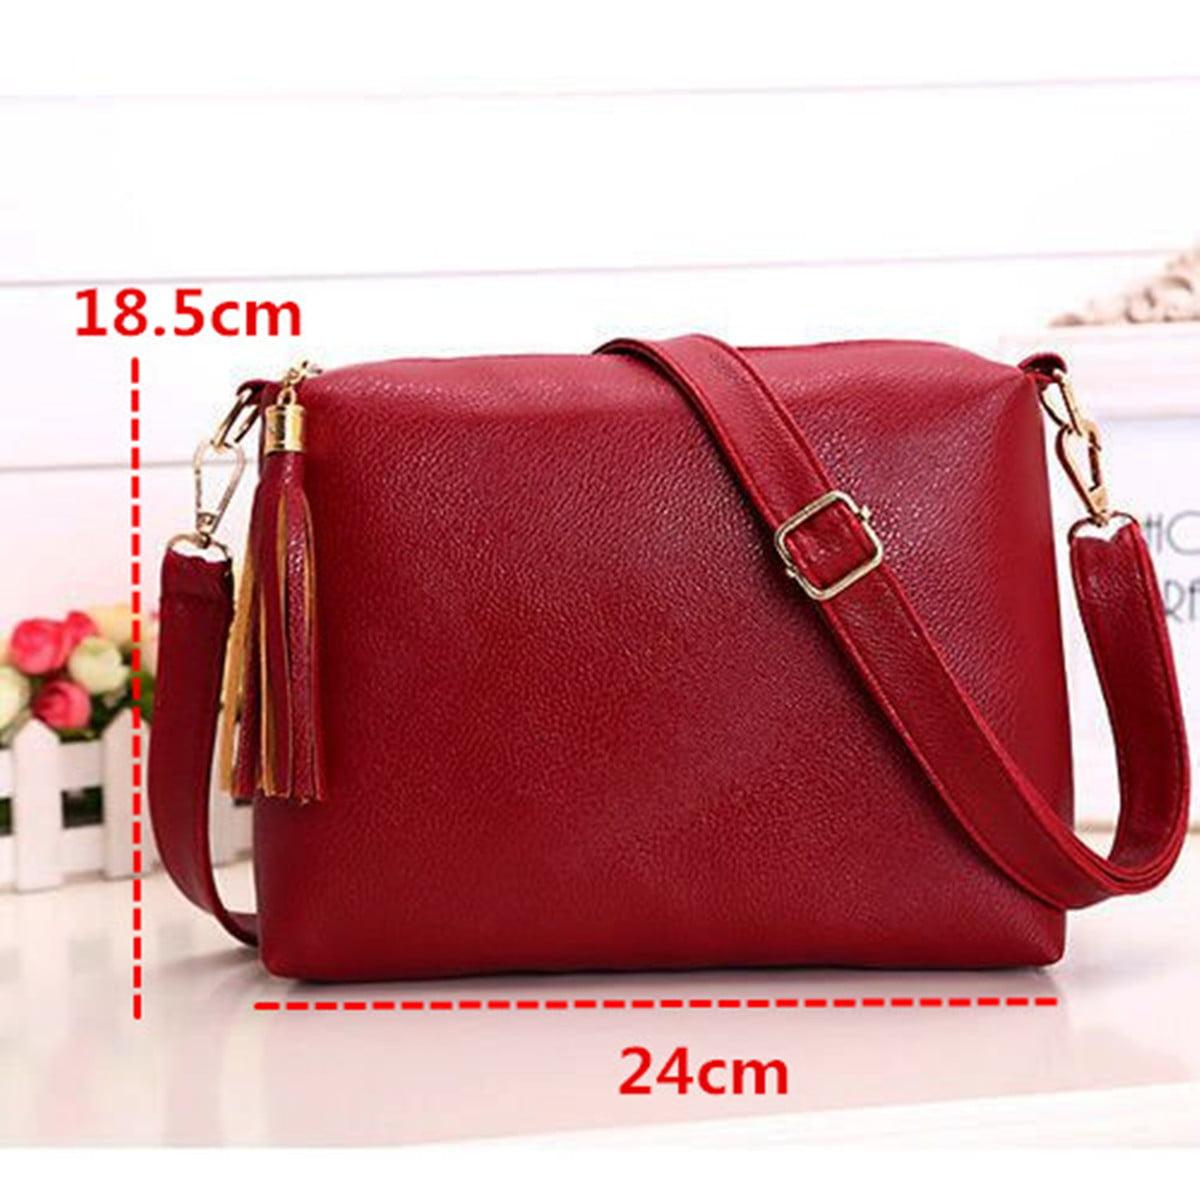 Women Shoulder Bag Handbags PU Leather Crossbody Purse Tote Satchel Fashion Gift